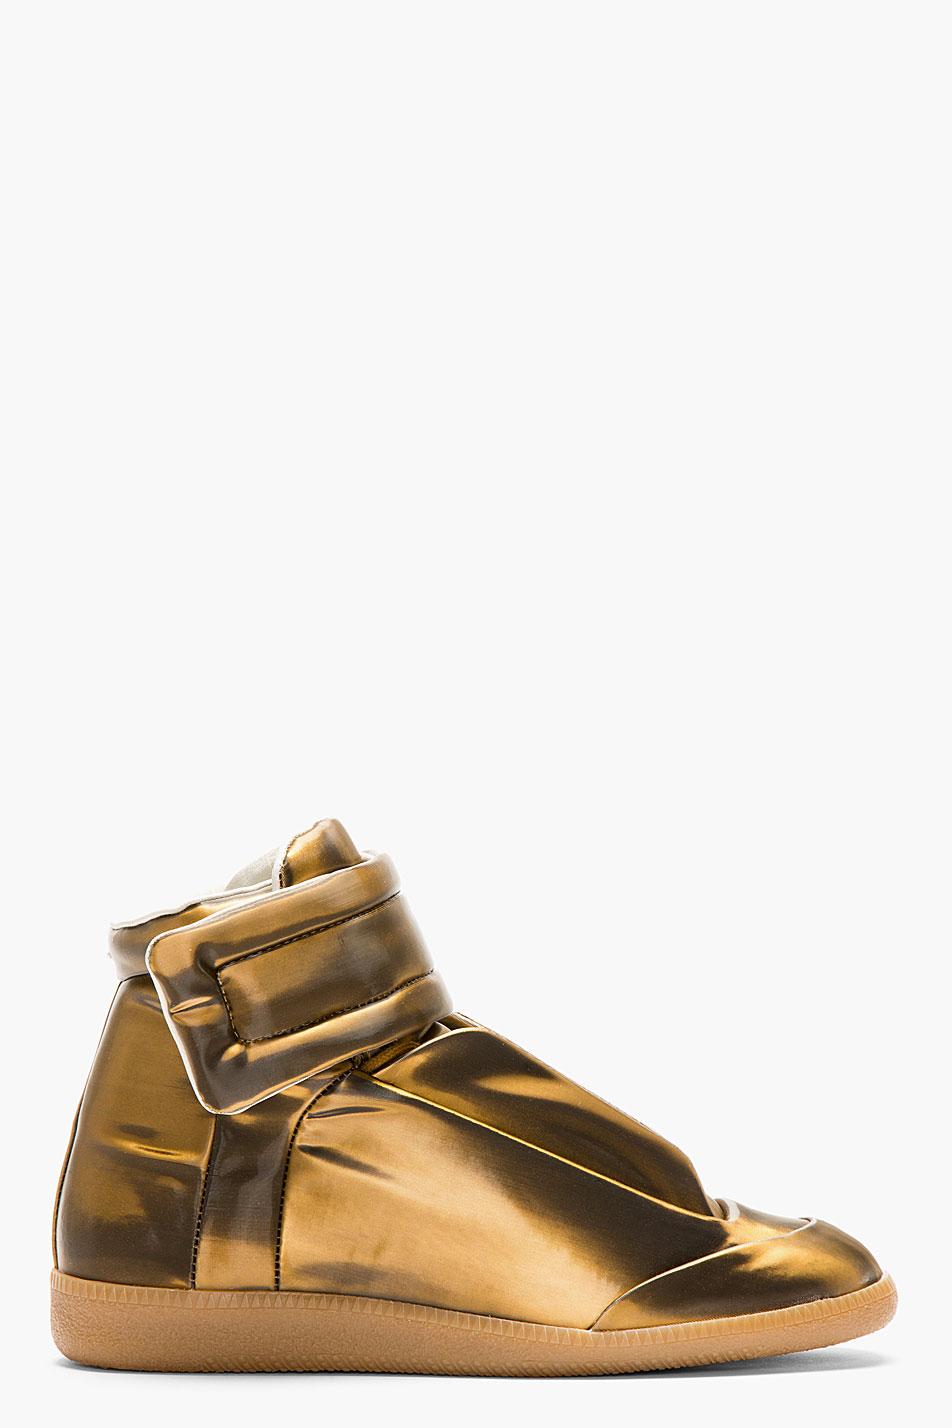 Copper Glossy Vinyl Maison Martin Margiela Gold Sneakers 3